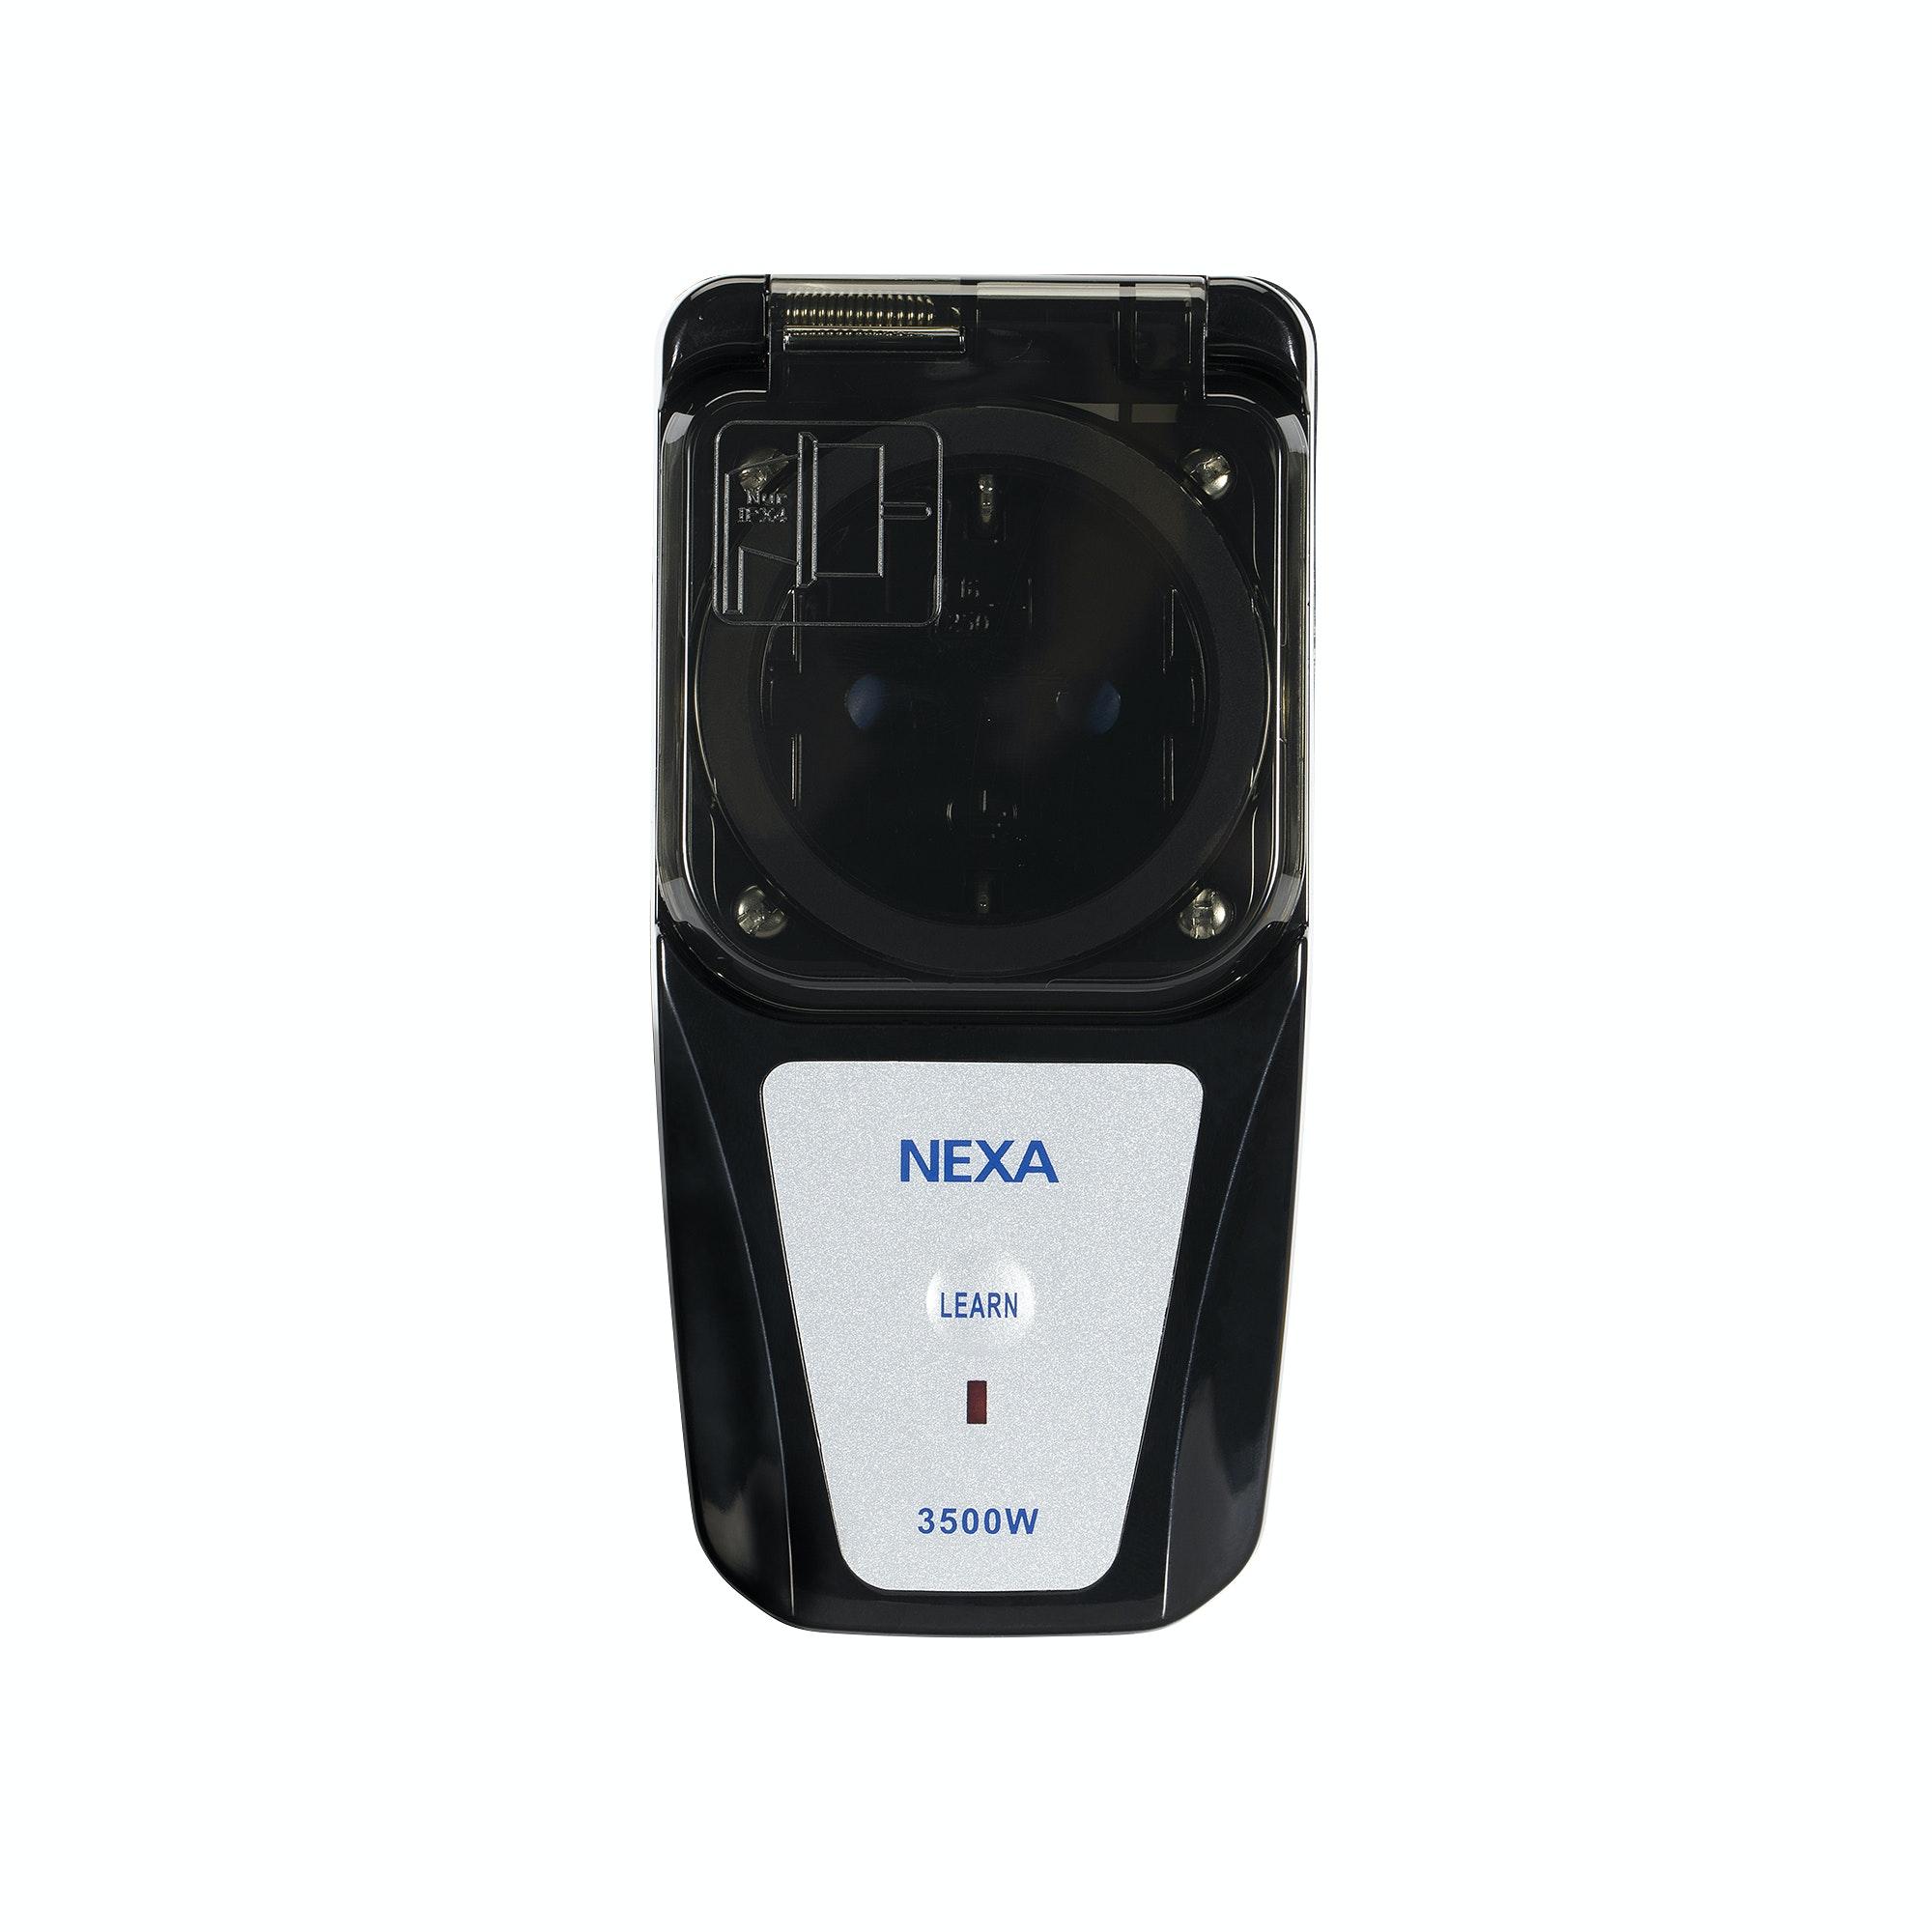 Mottagare Nexa 14432 Utomhus Extra